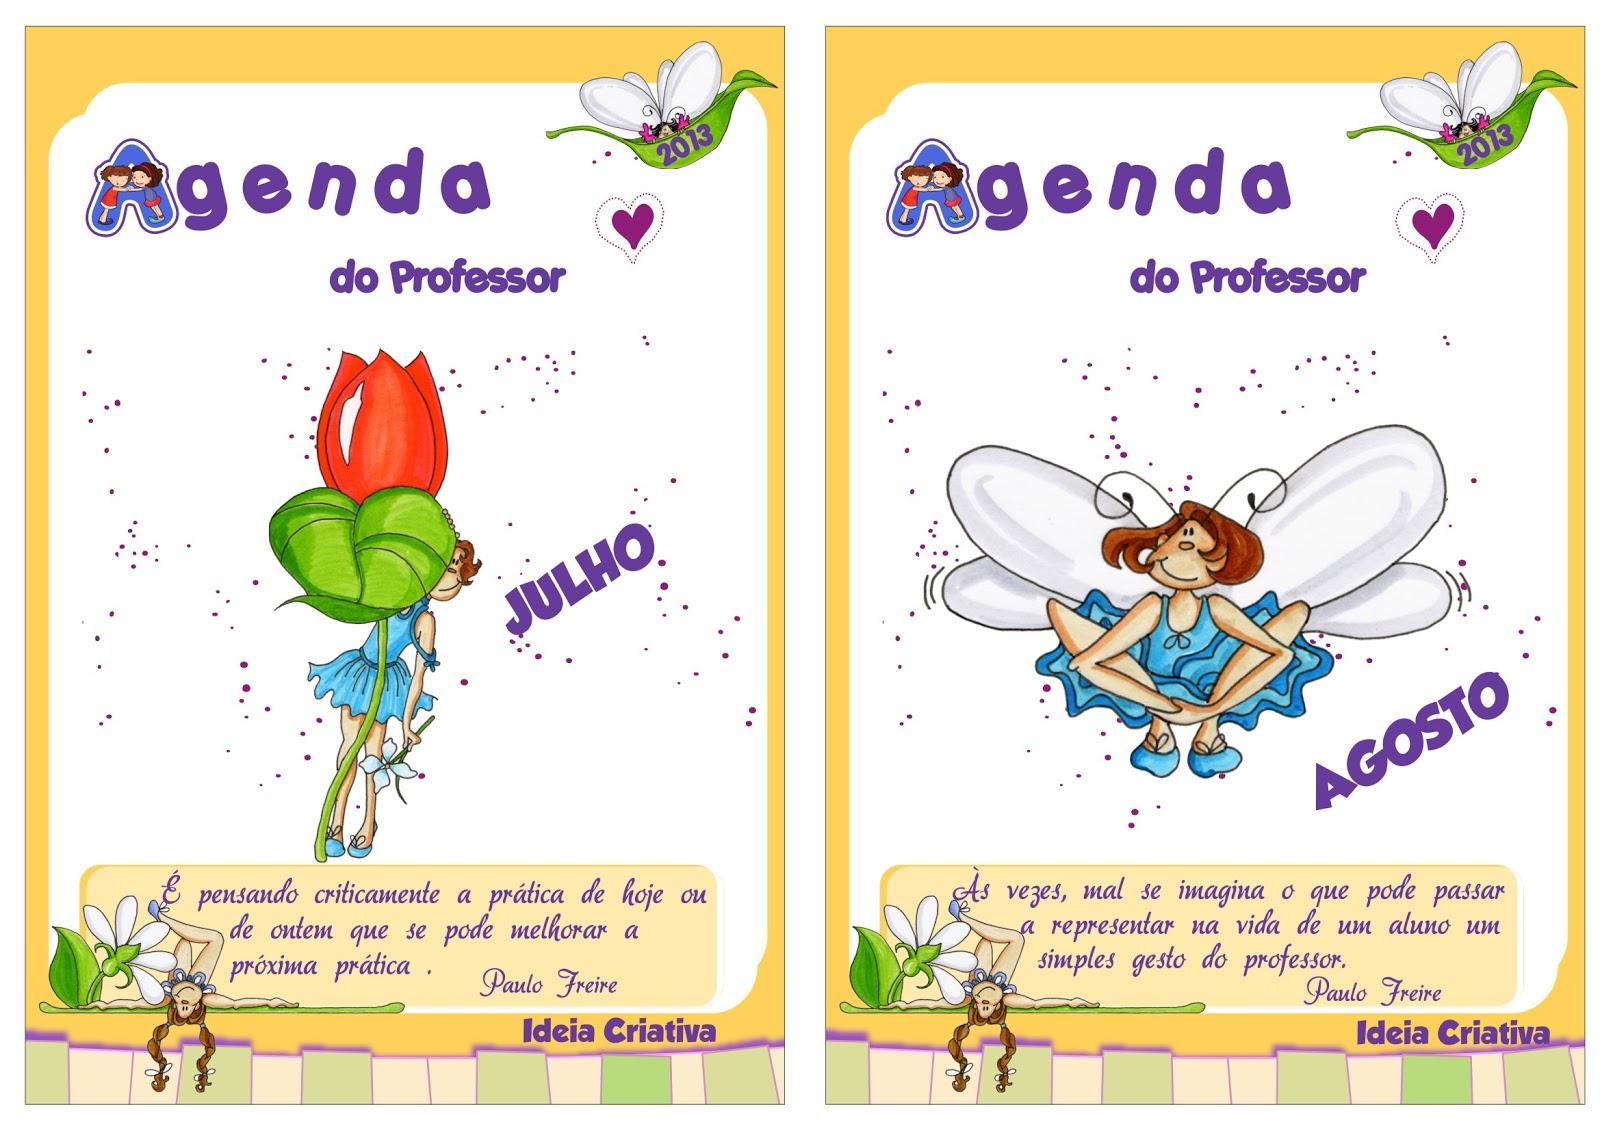 Agenda Do Professor 2013 Ideia Criativa Para Ideia Criativa